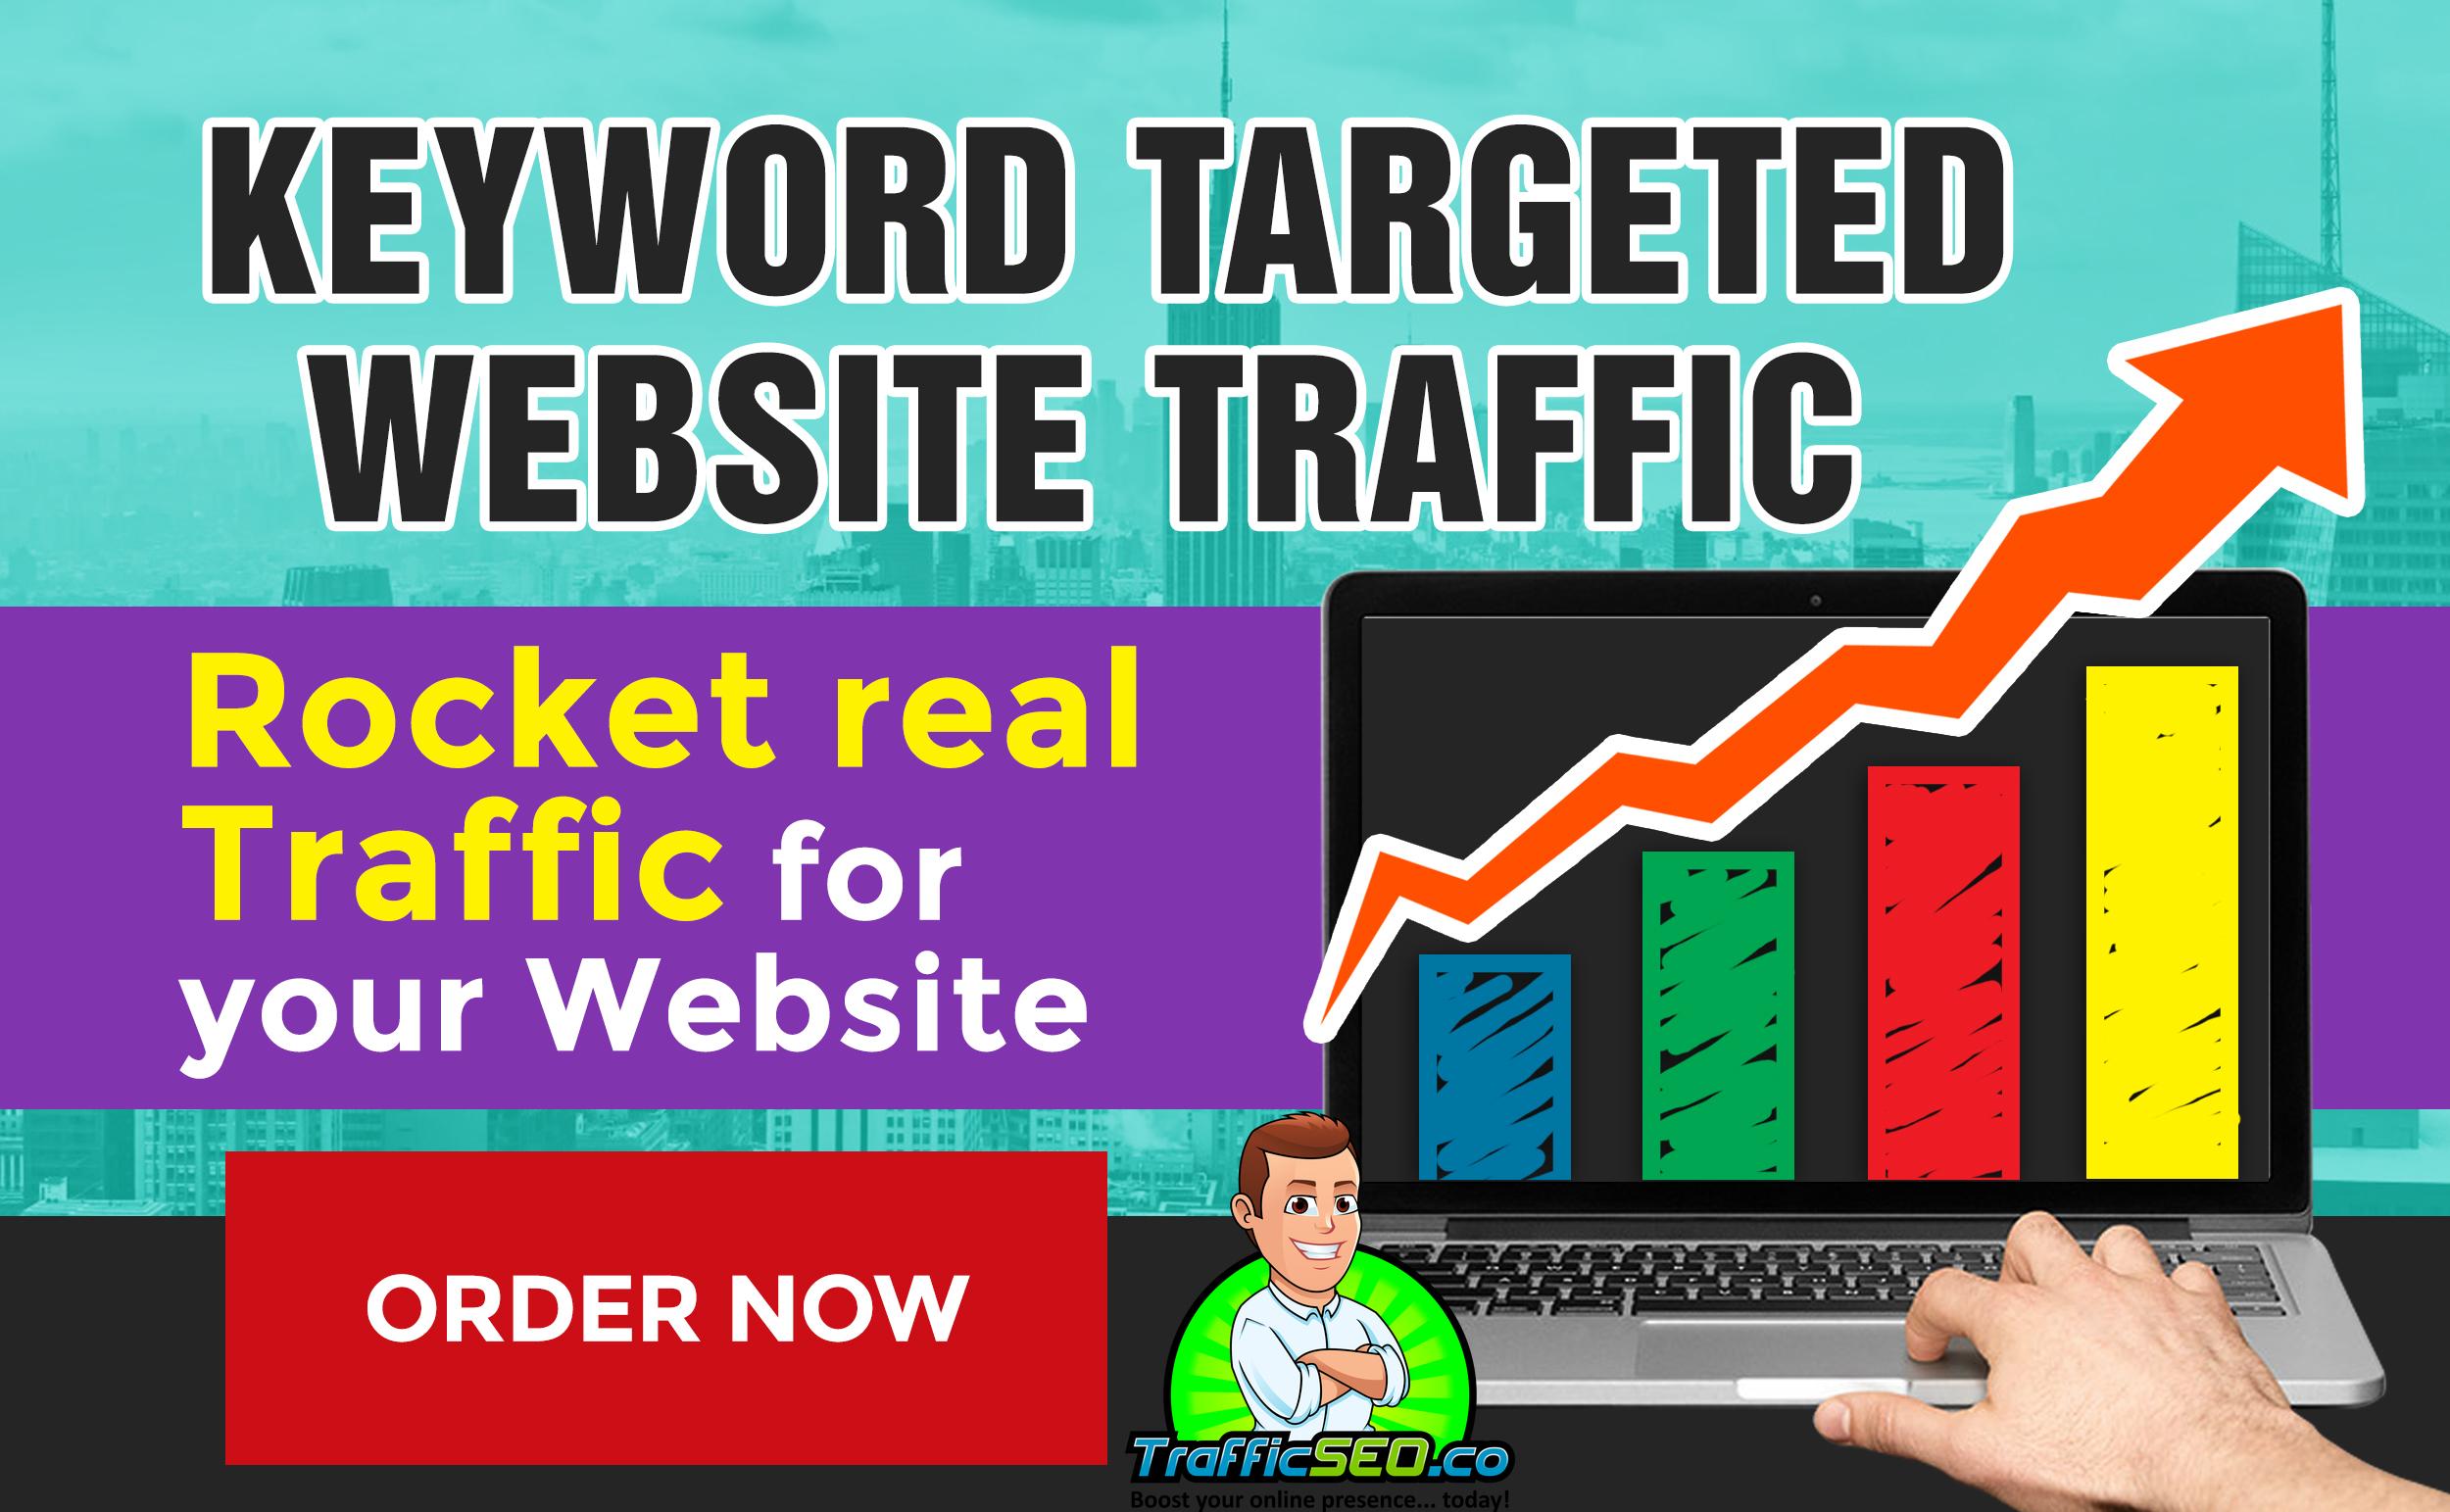 10K Keyword Targeted Traffic from Google